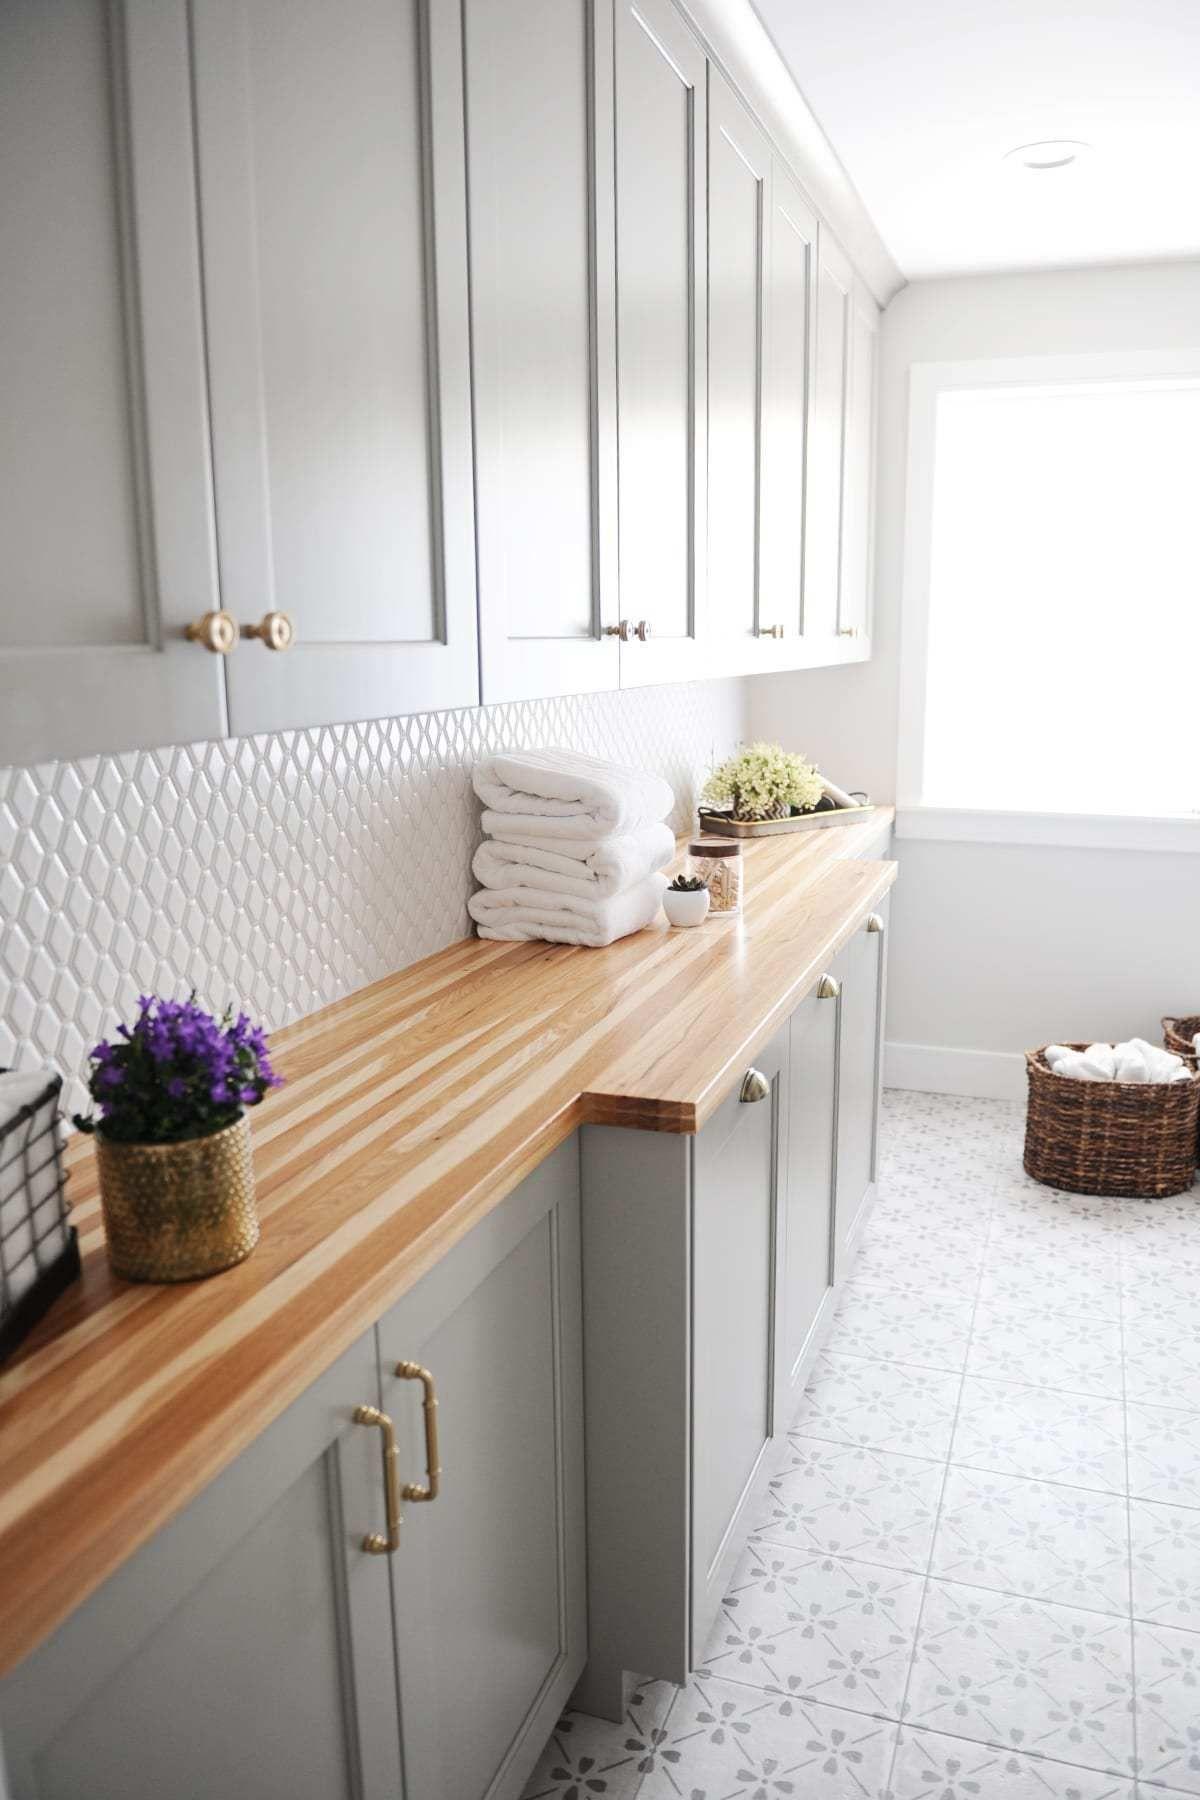 Rooms We Love Blogger Home Tour Laundry Room Tile Room Tiles Design Laundry Room Flooring